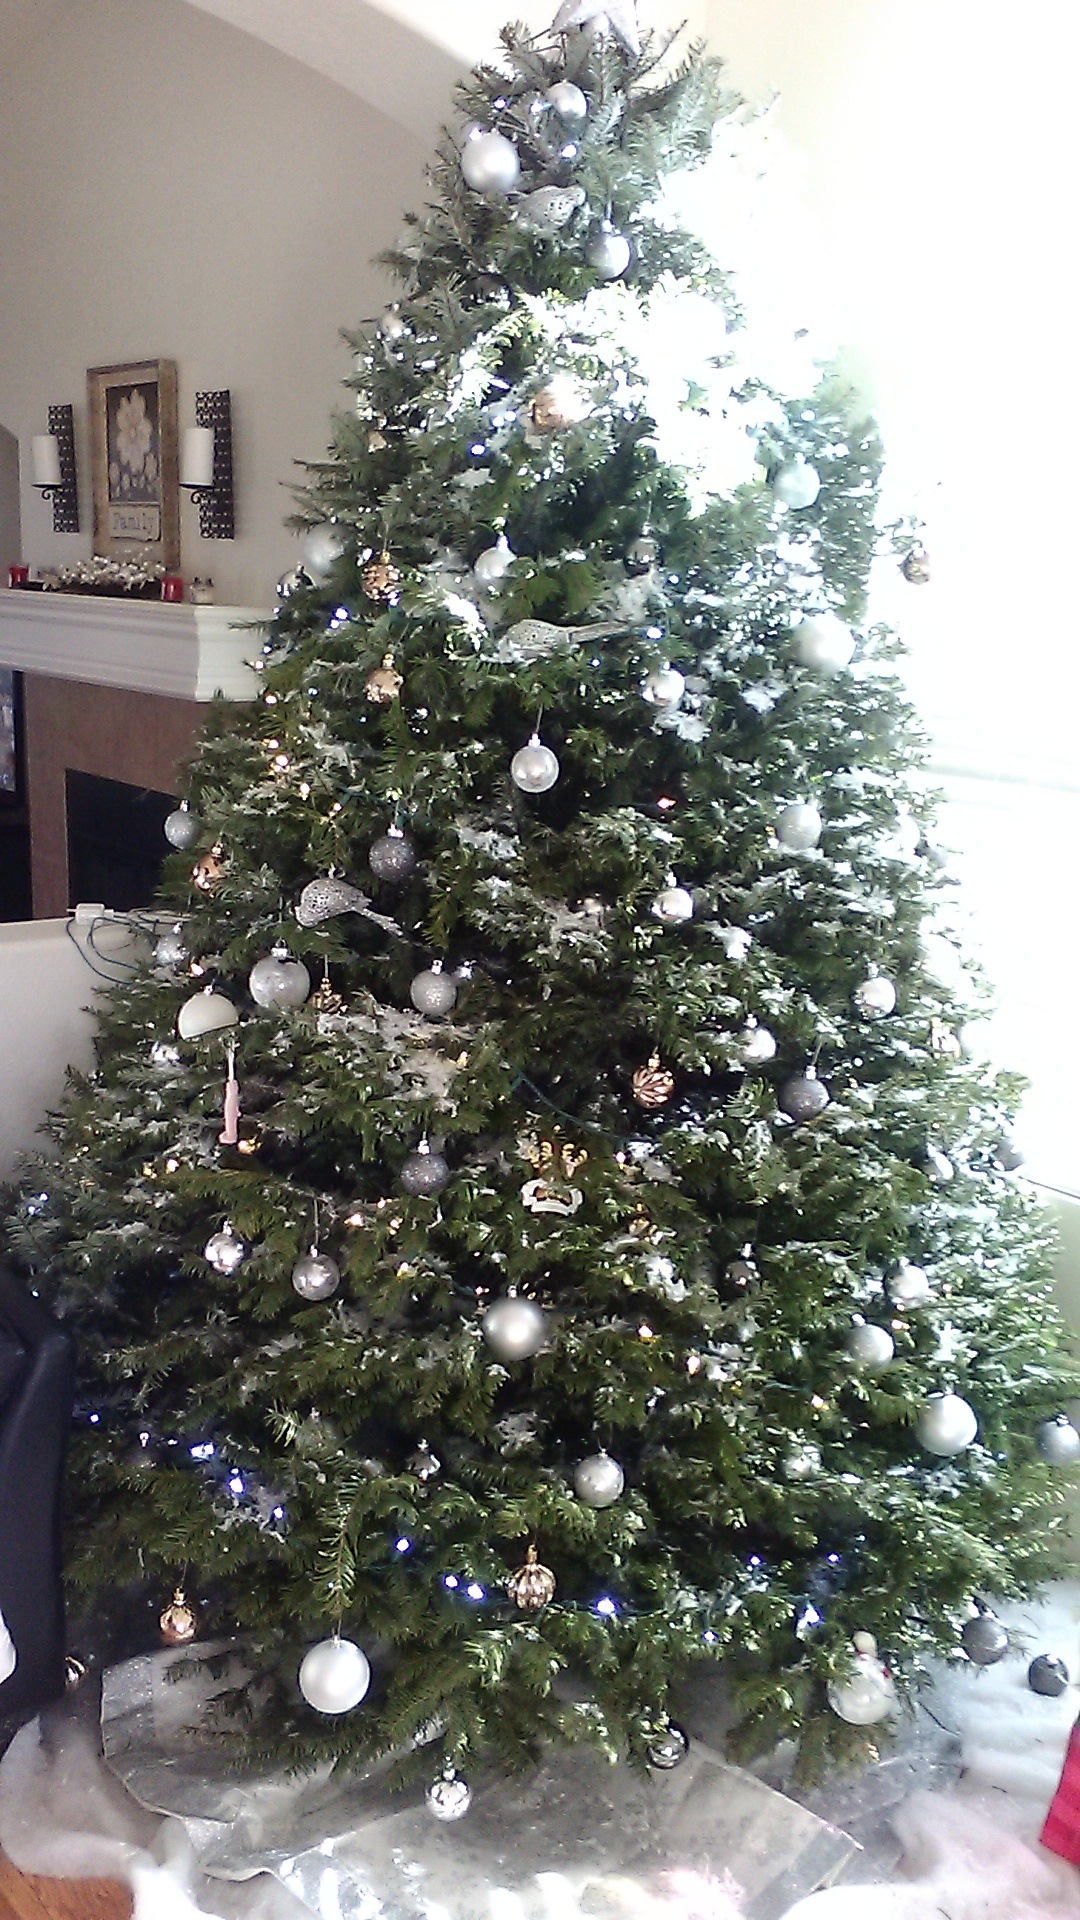 MERRY CHRISTMAS EVERYONE by Keri E. Carter